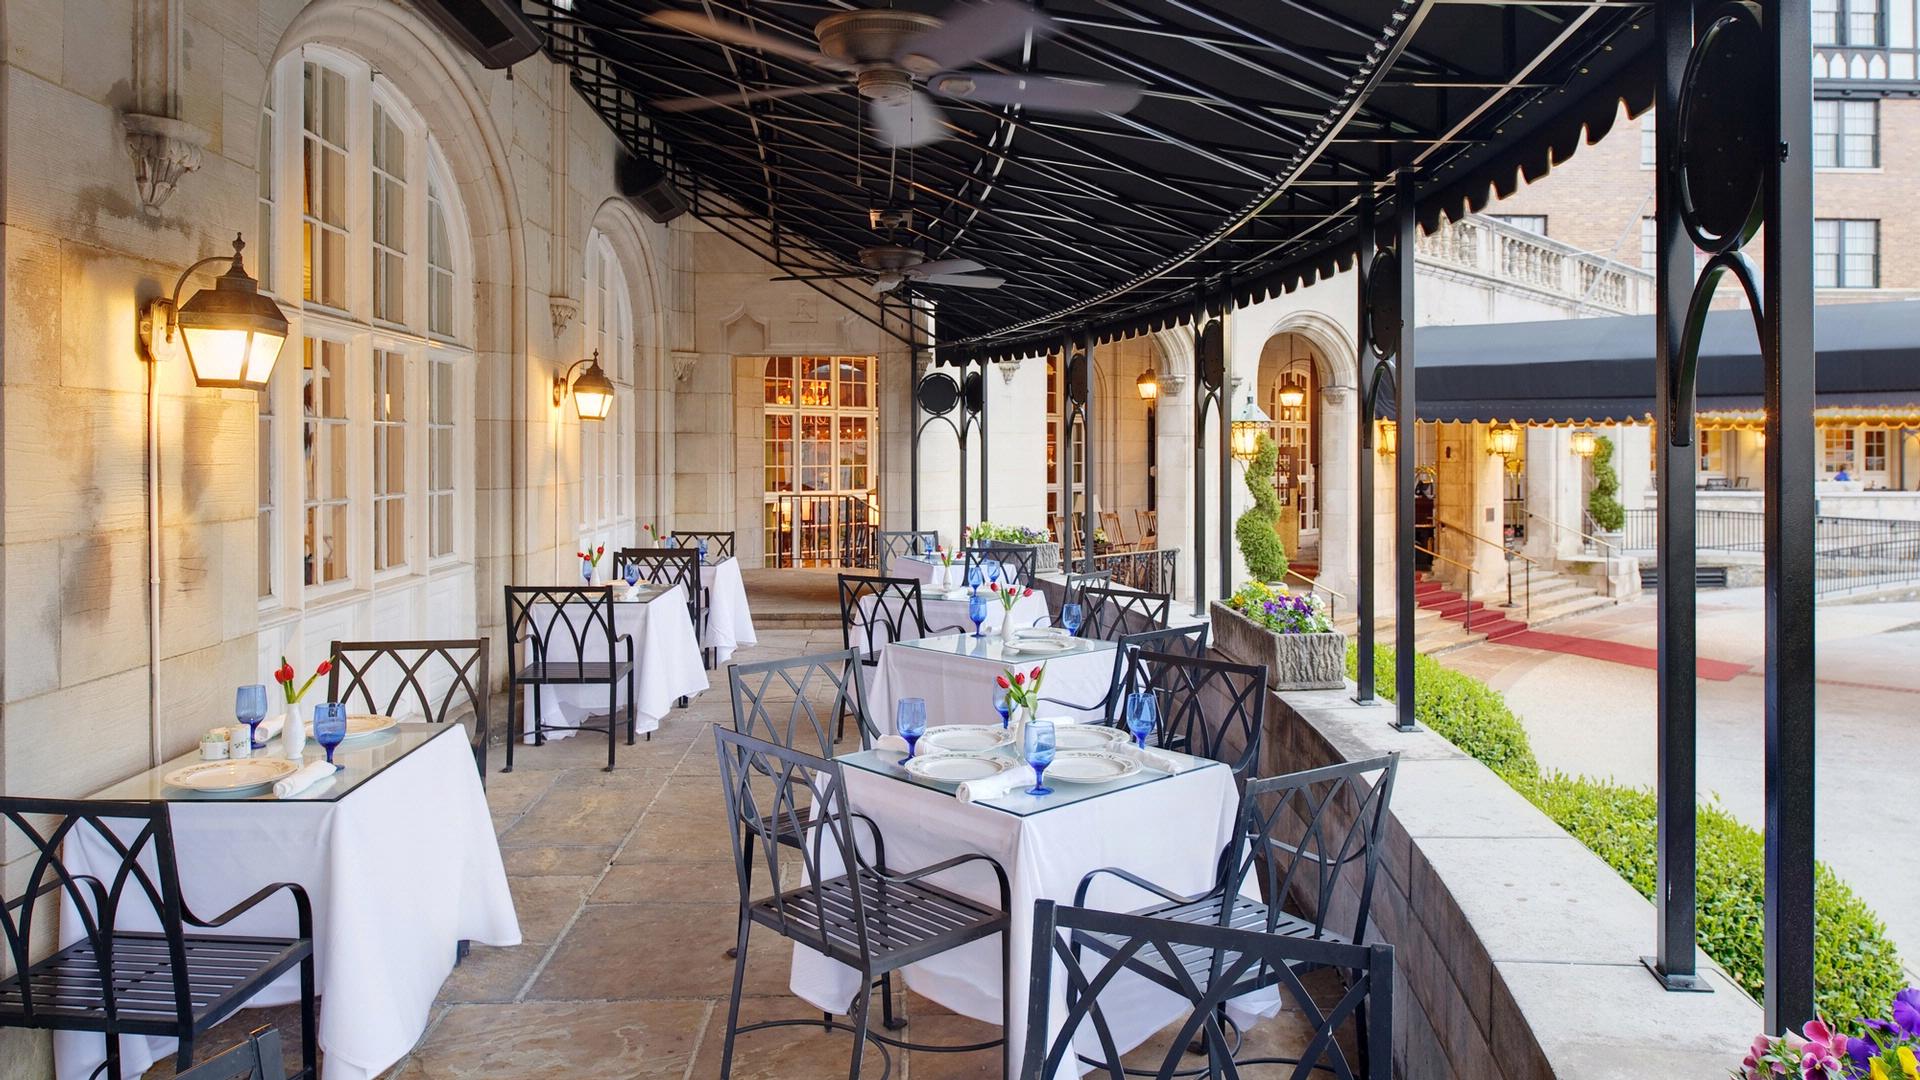 downtown roanoke restaurants historic hotel roanoke va s blue outdoor dining area at hotel roanoke